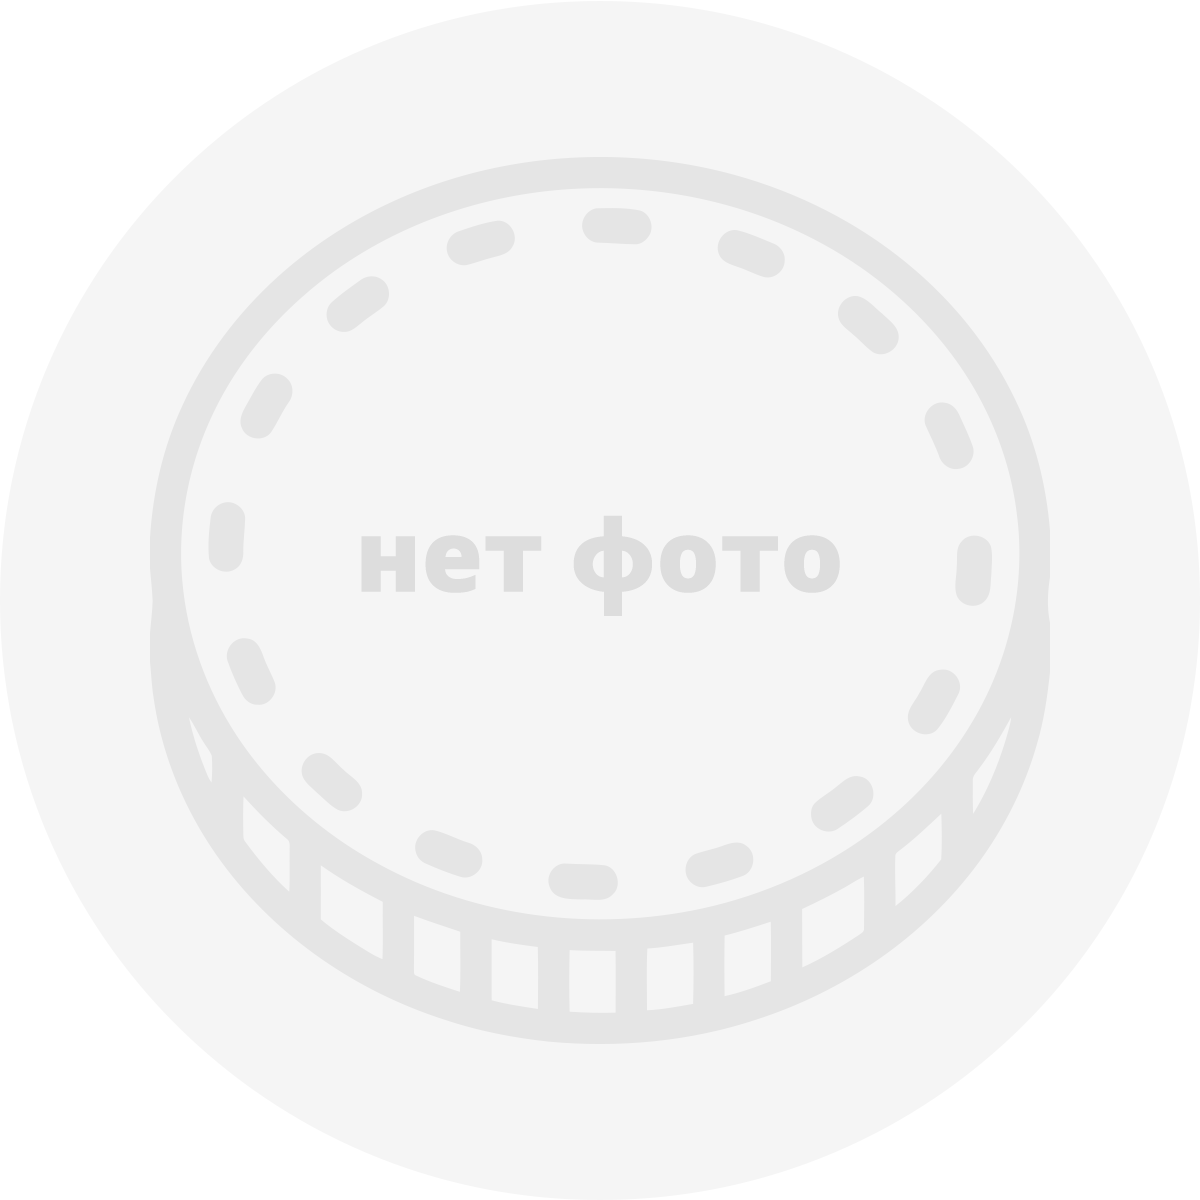 Турция, 2 1/2 лиры (2015 г.)